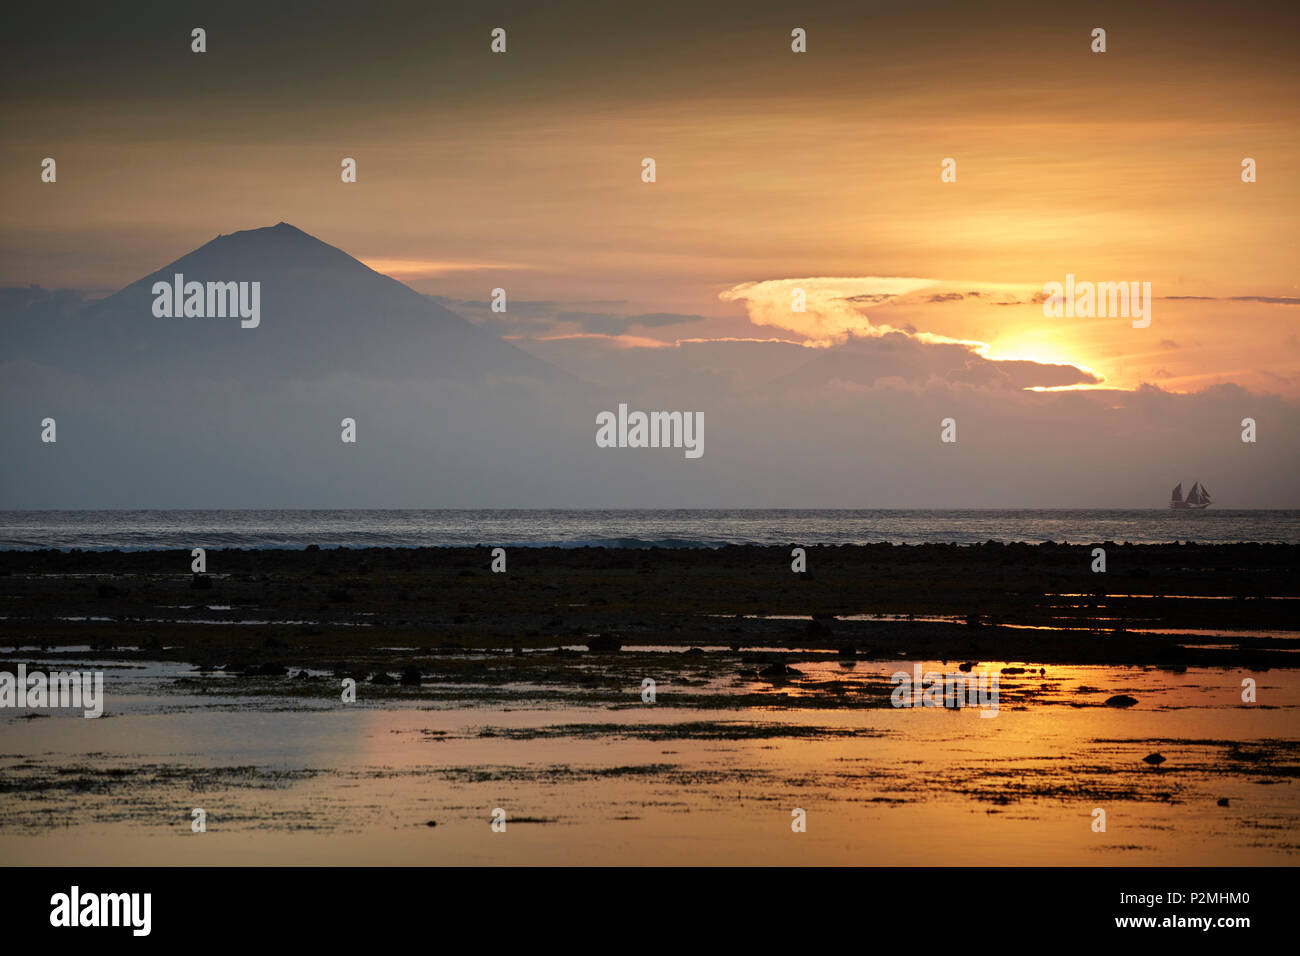 Sunset, view of Bali and the volcanoes Agung and Batur, Gili Trawangan, Lombok, Indonesia - Stock Image